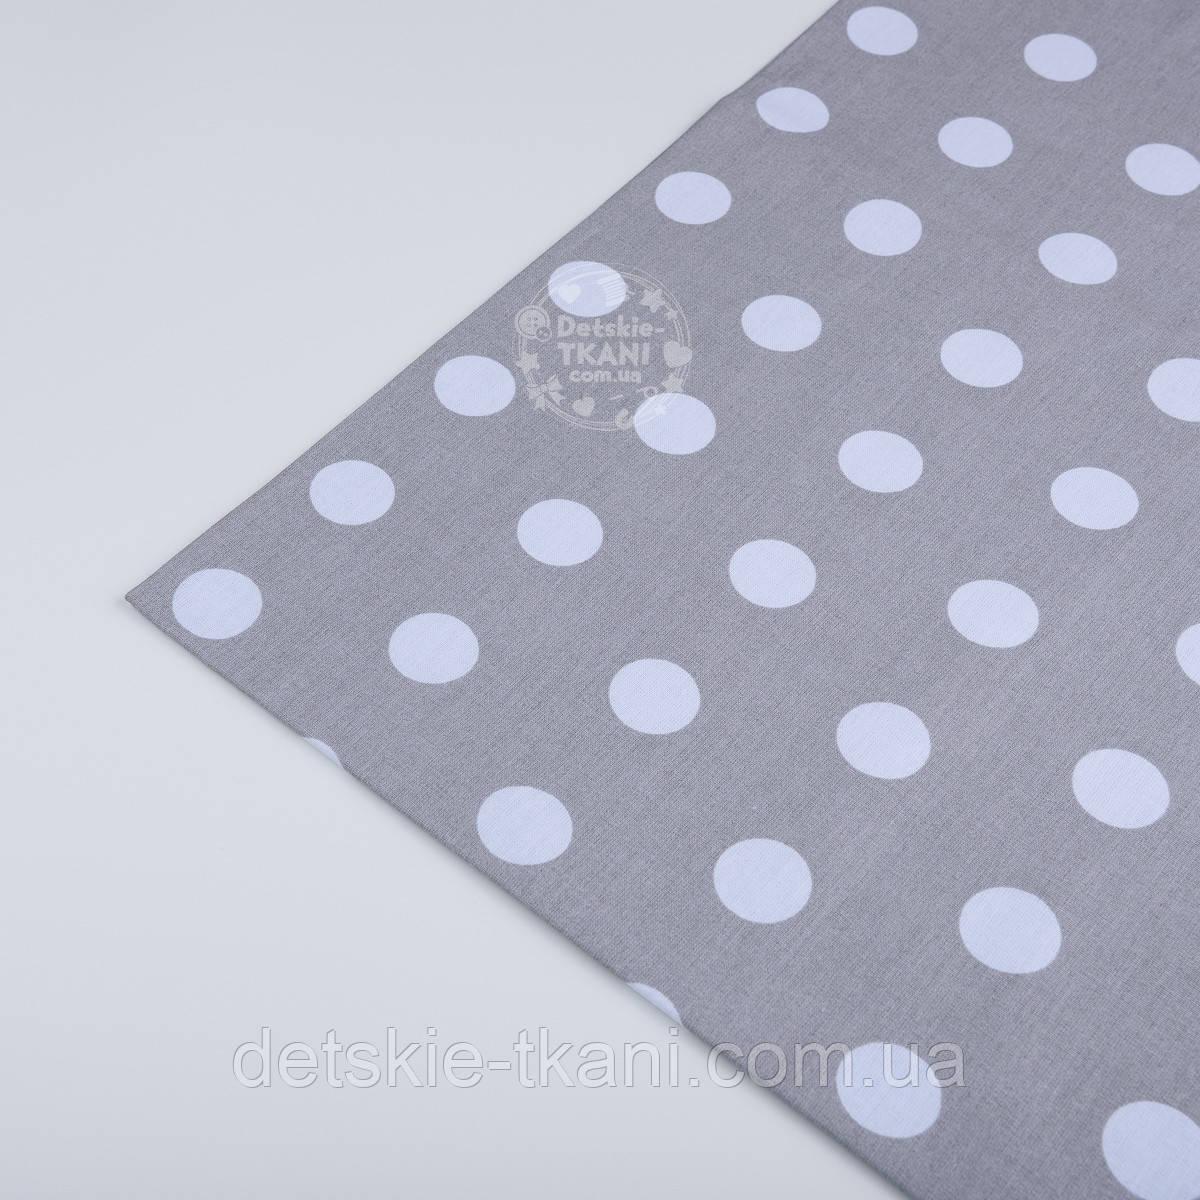 Лоскут ткани №11 размером  32*80 см